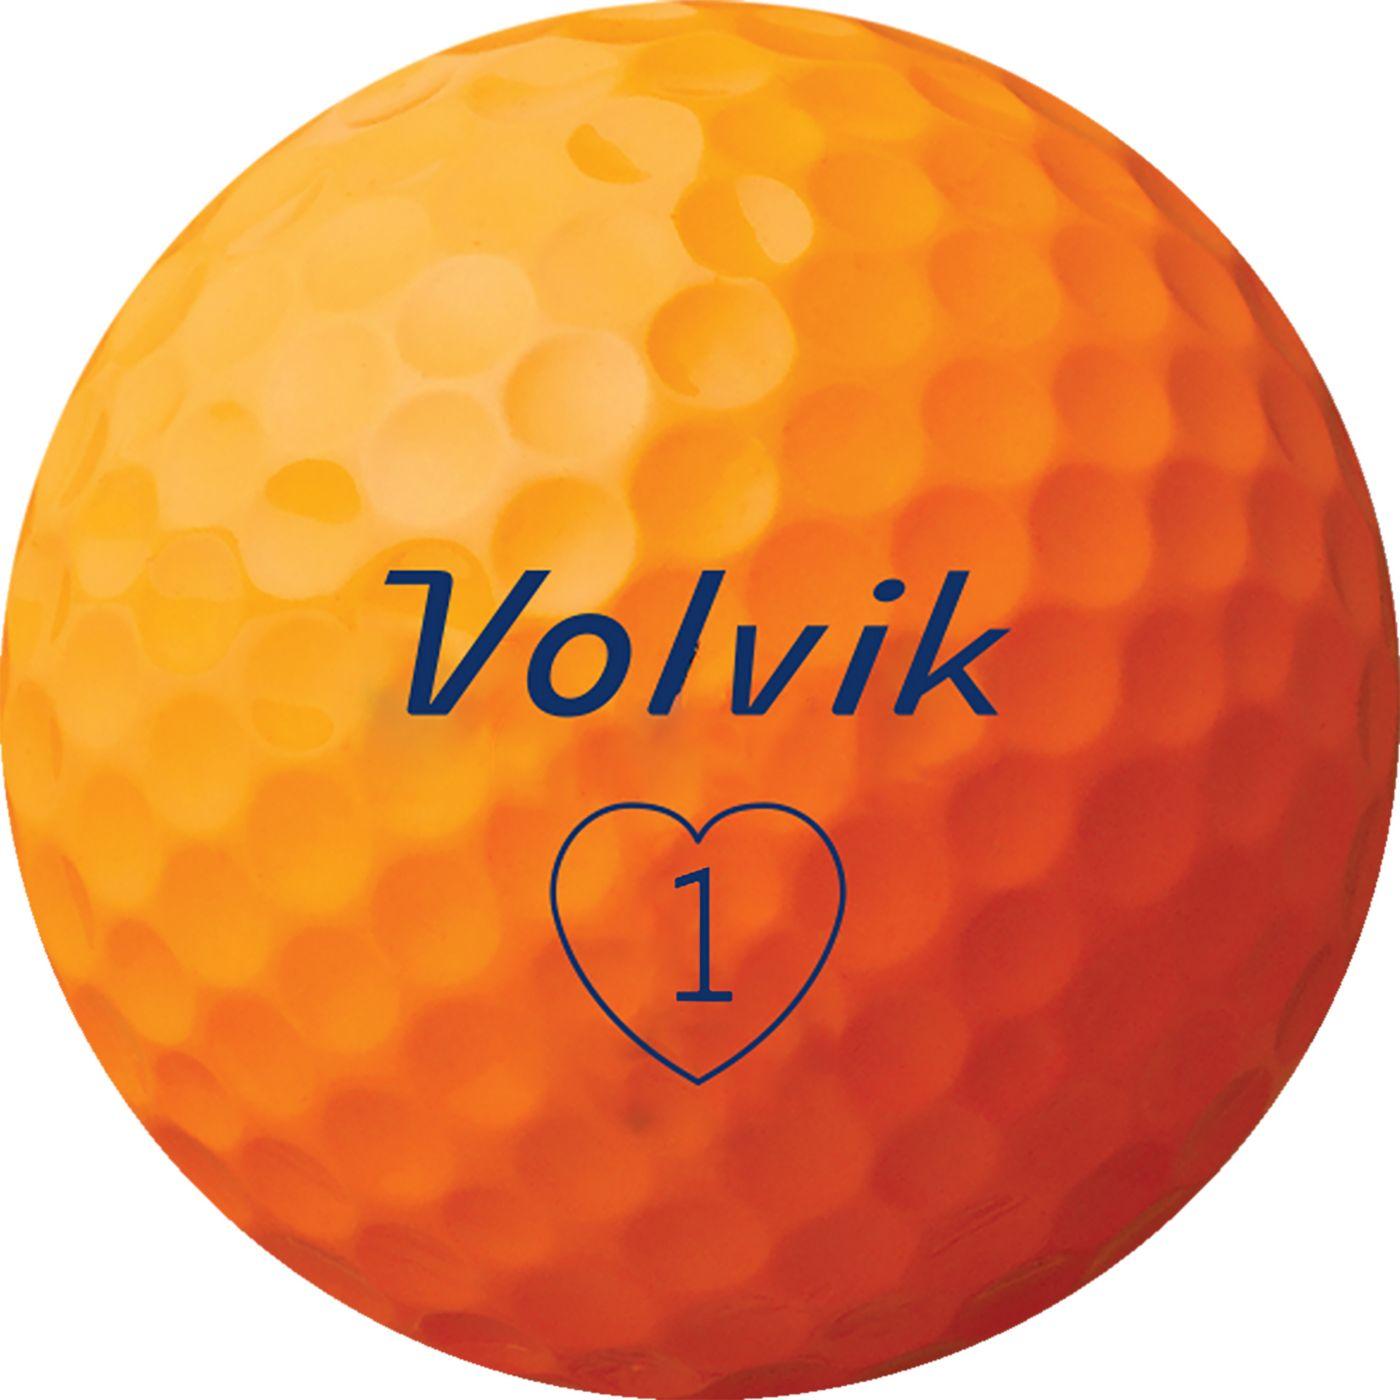 Volvik 2019 S3 Orange Golf Balls